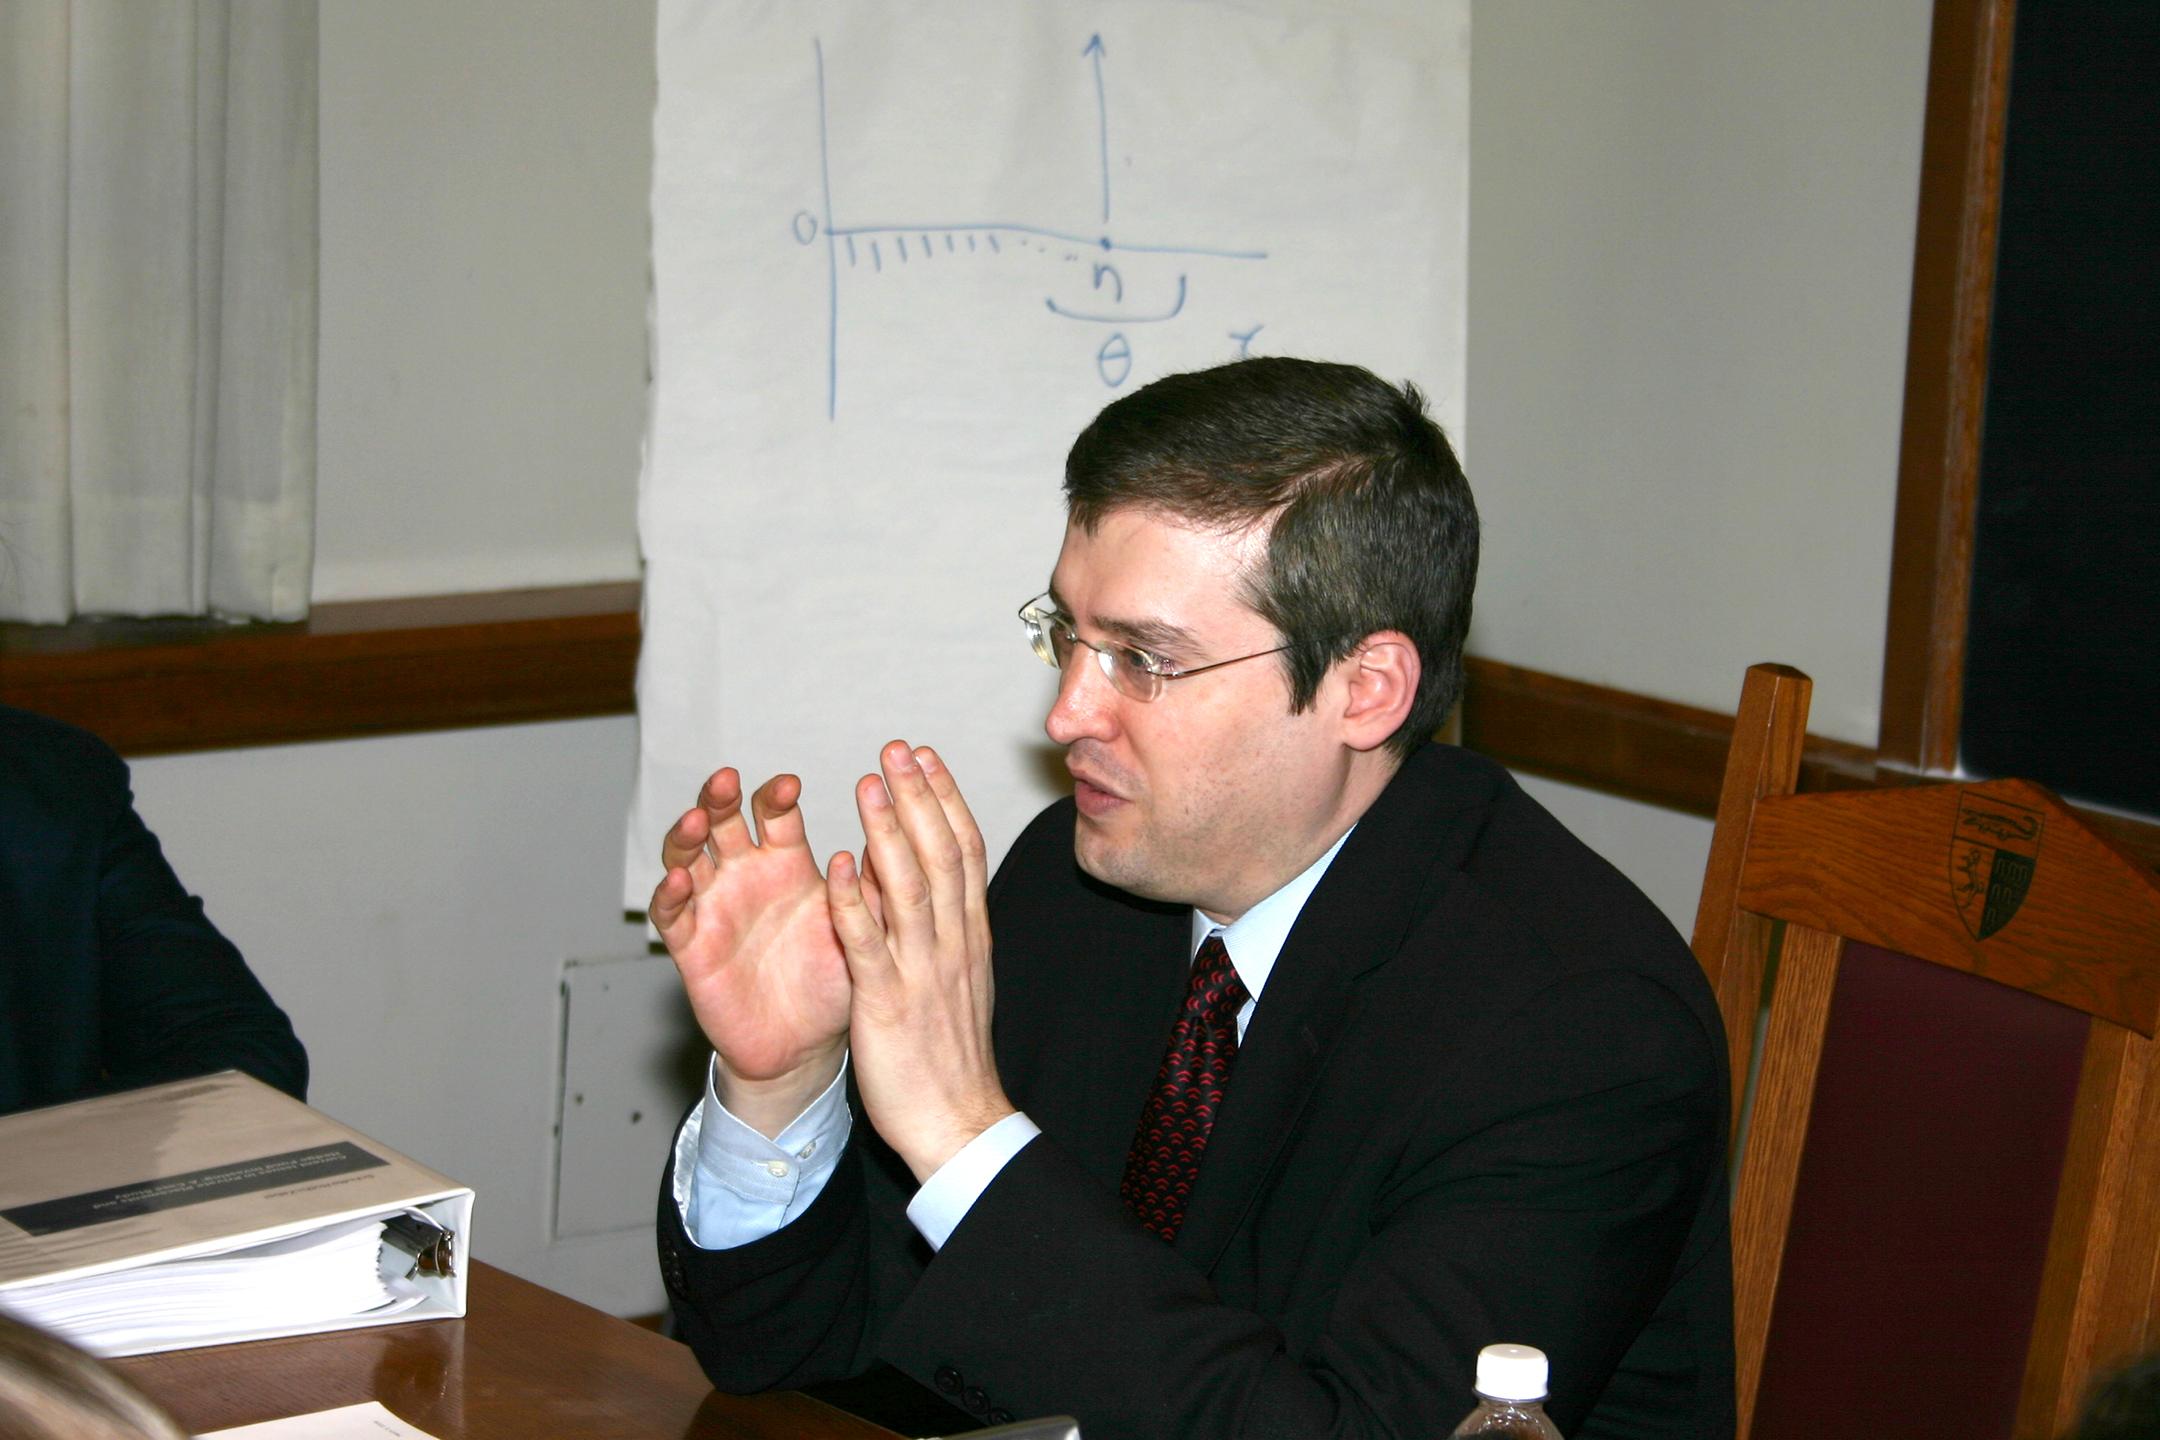 Eleazer Klein '91